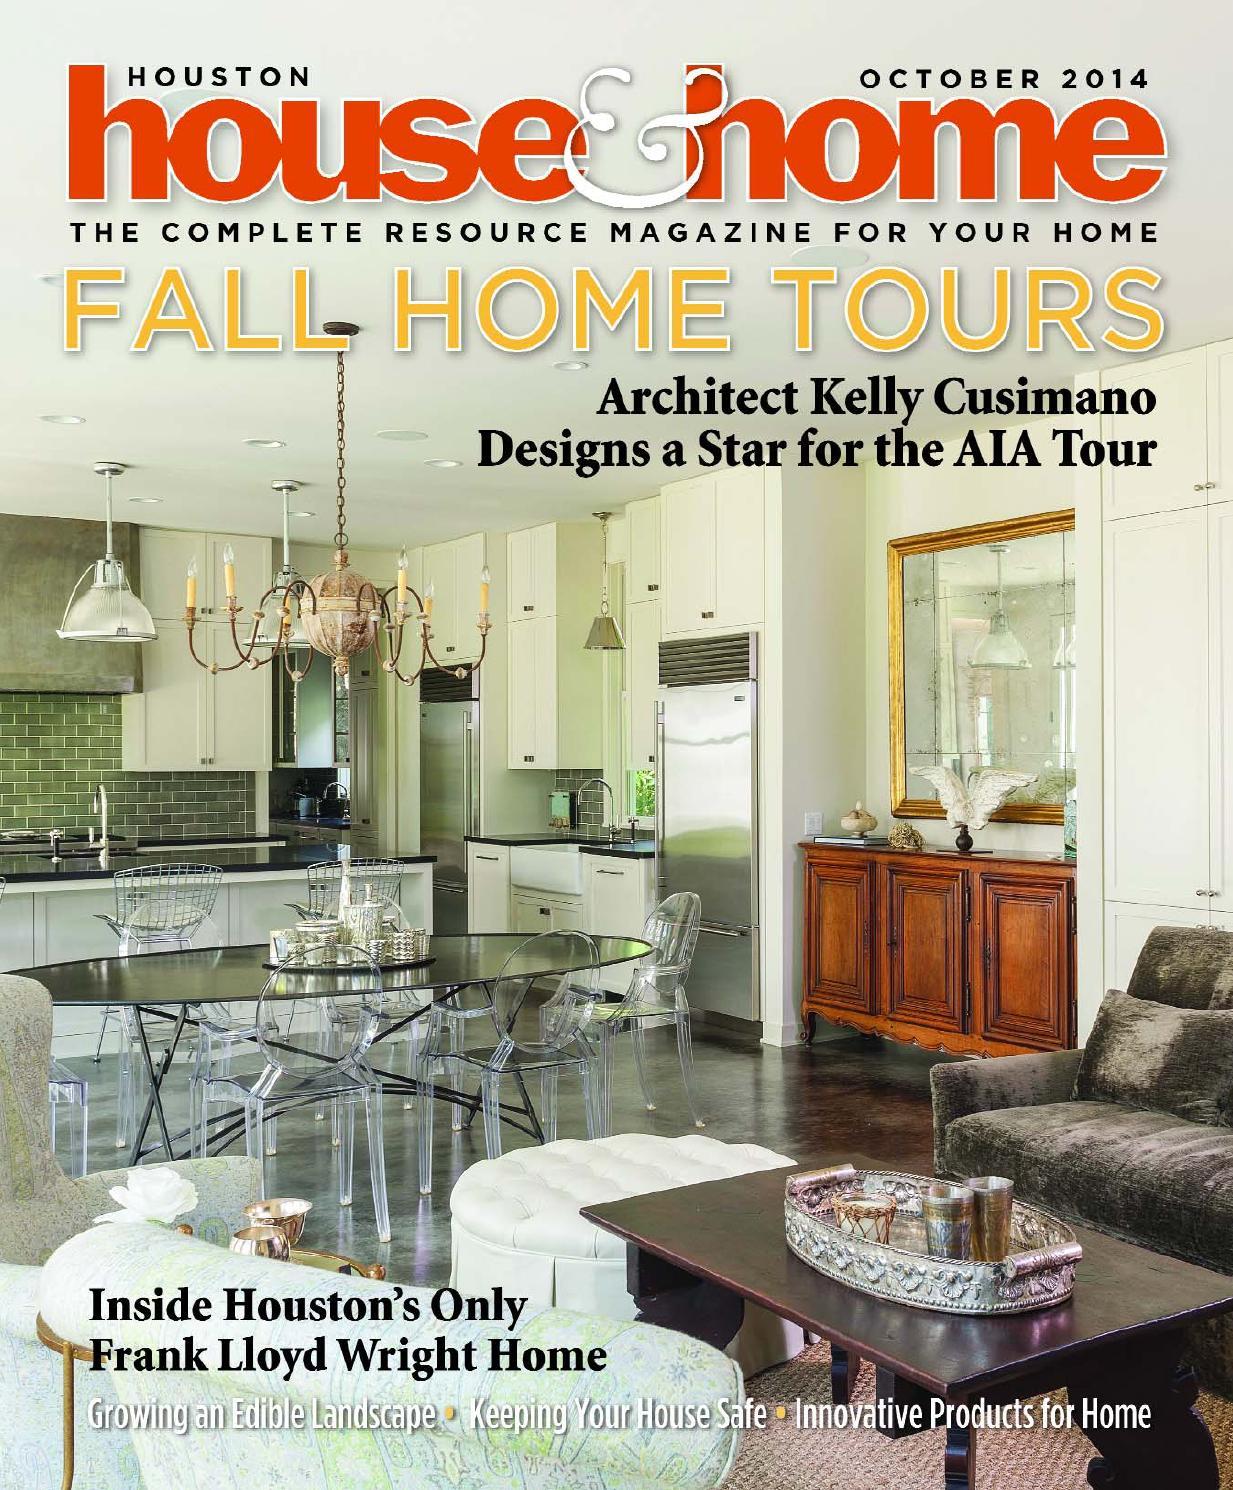 1014 Houhousehome Vir By Houston House & Home Magazine